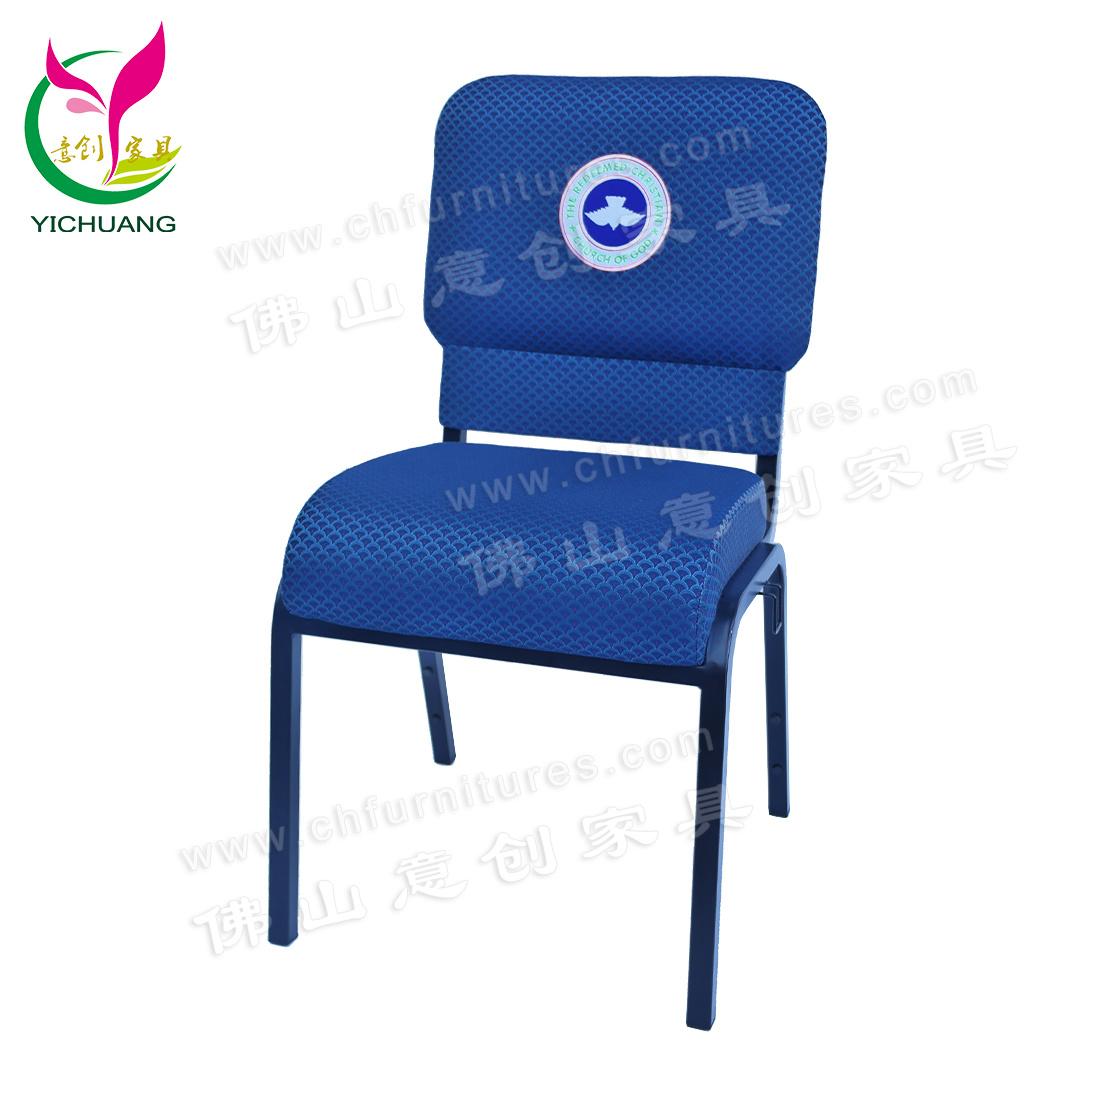 Hot Item Yc G81 Wholesale Interlocking Used Blue Church Chairs For Auditorium